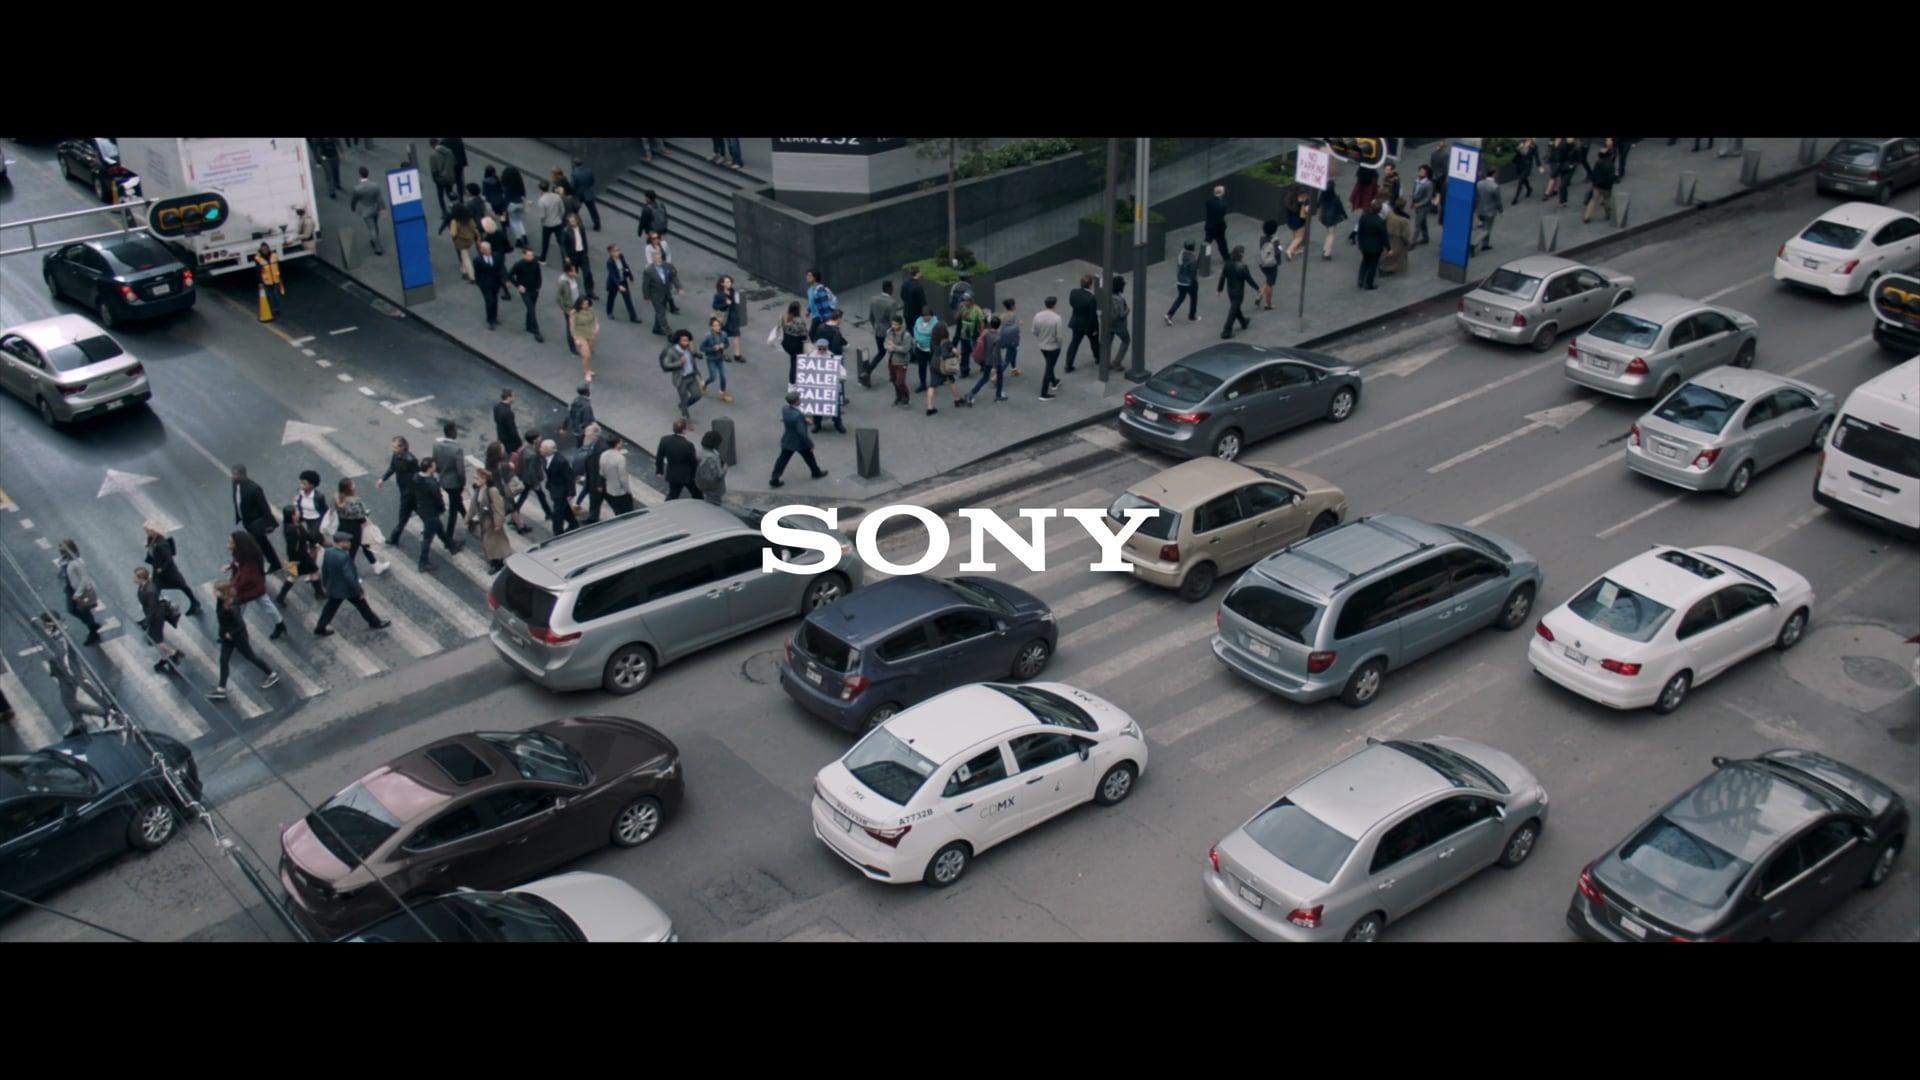 SONY - noise cancelling headphones